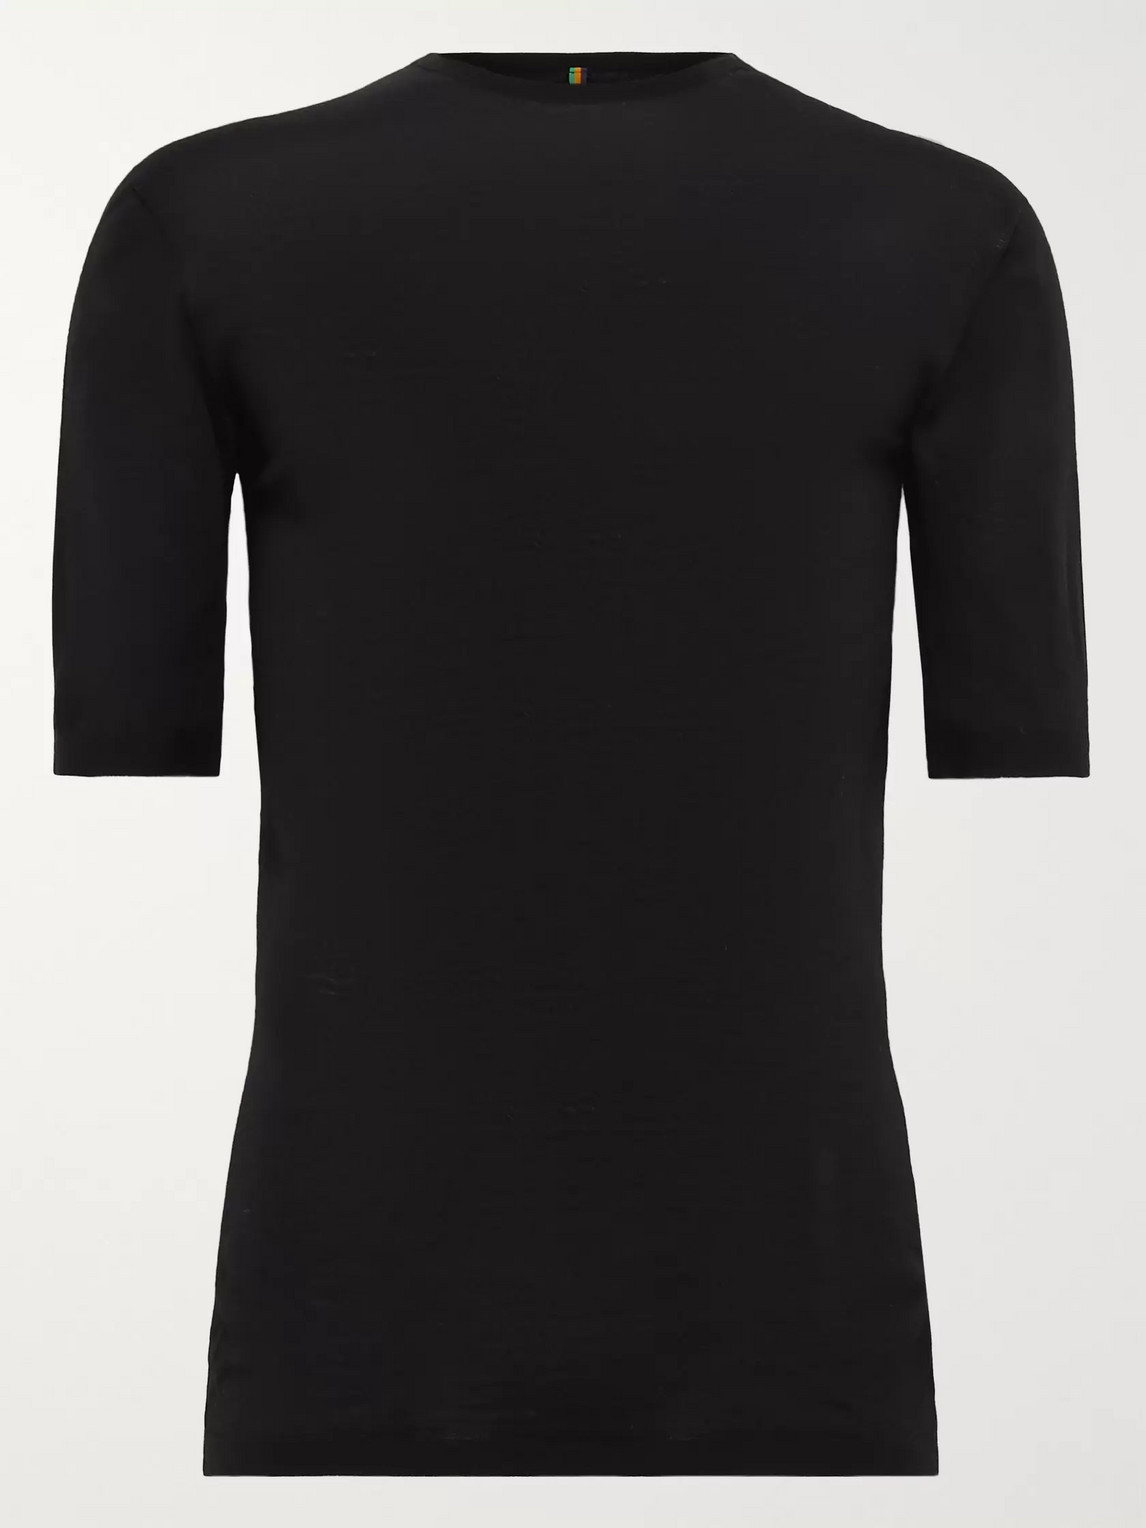 Iffley Road Exmoor Merino Wool Base Layer In Black